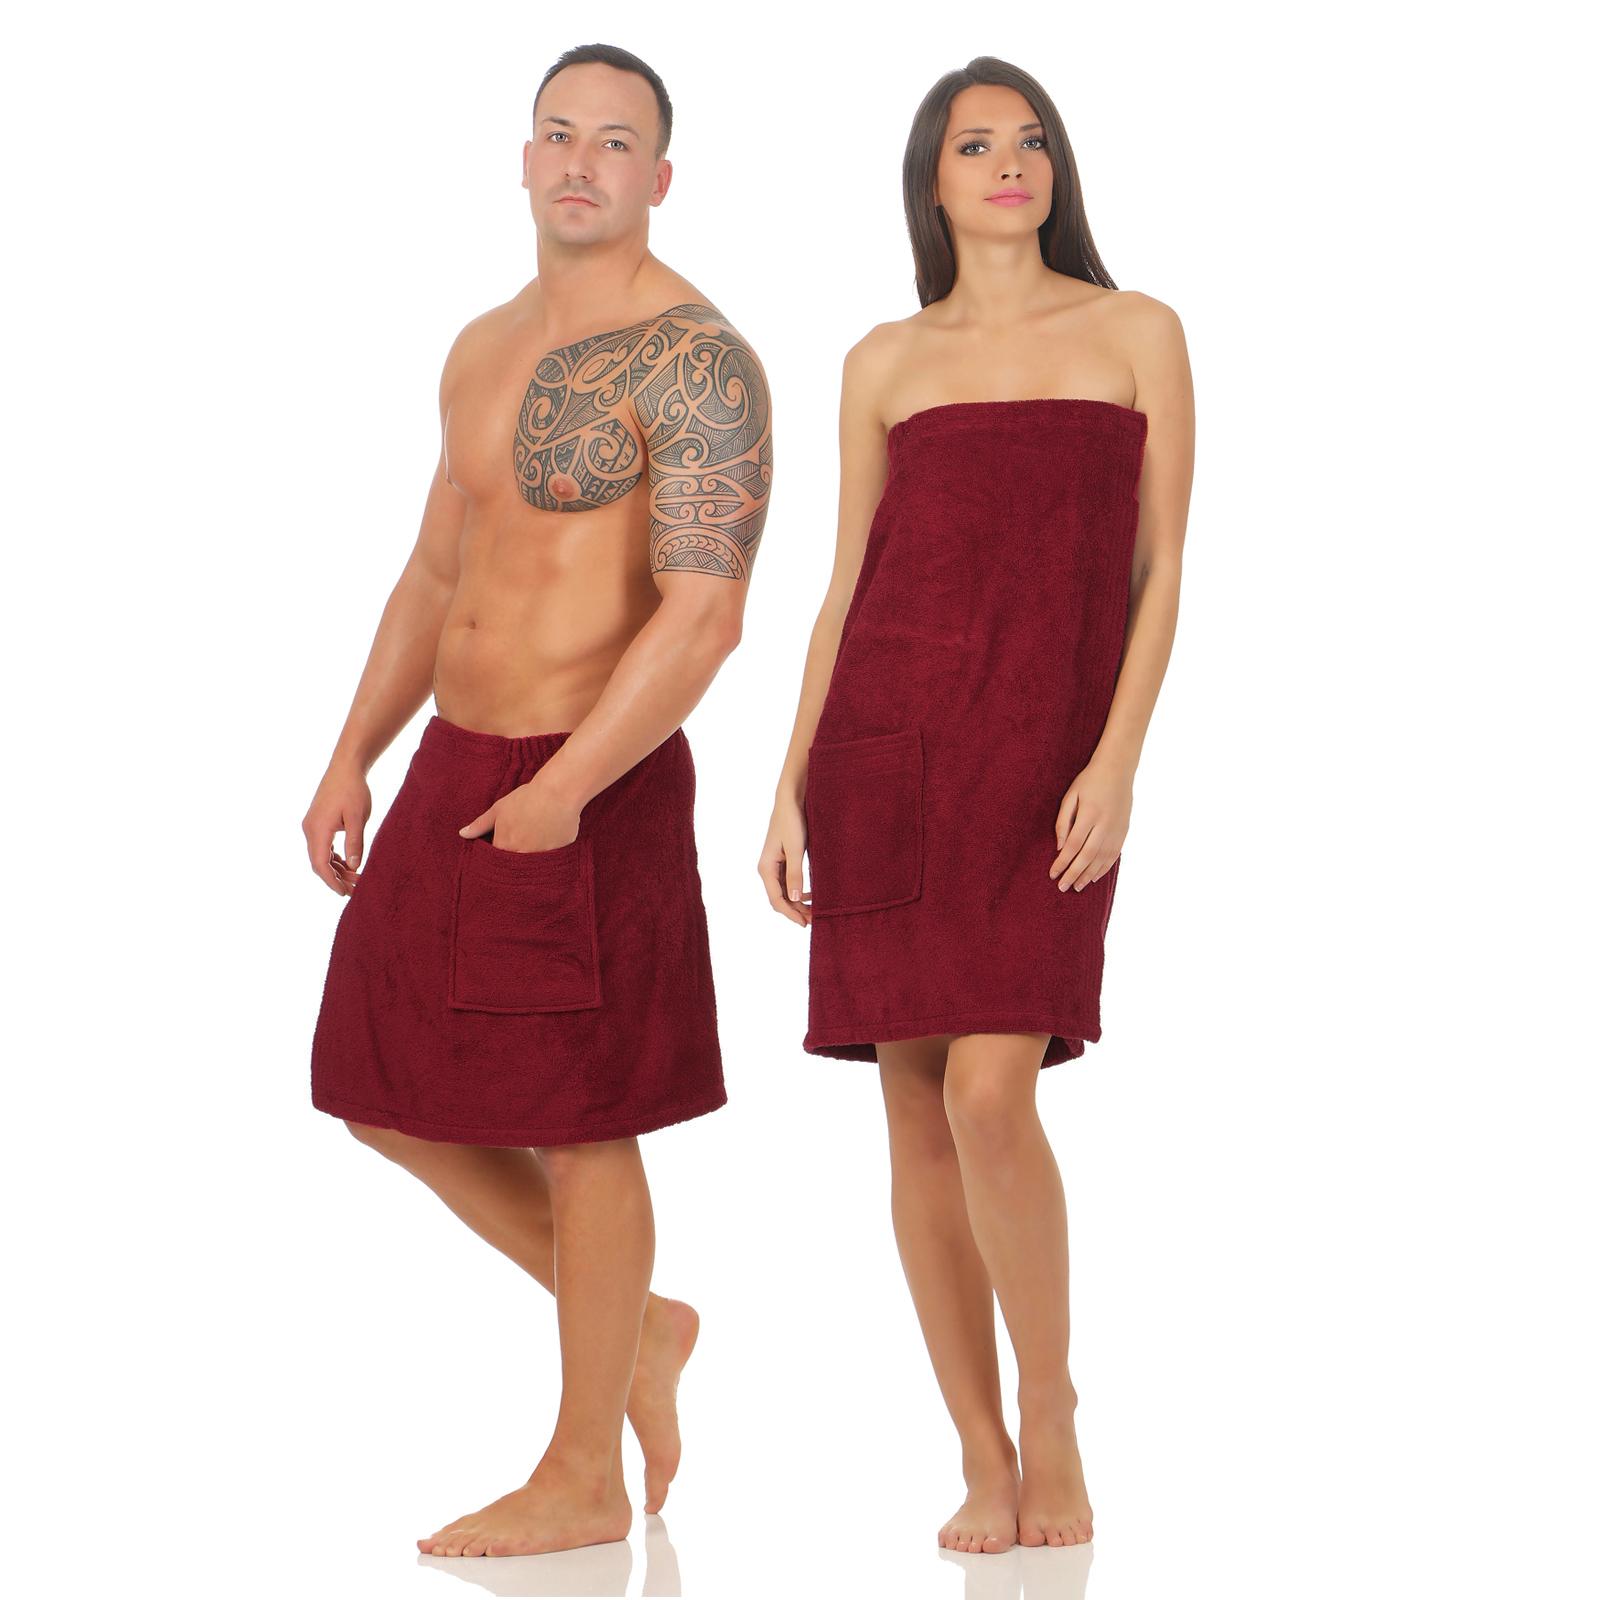 damen herren saunakilt saunatuch wellness klettverschluss sarong kilt uni farben ebay. Black Bedroom Furniture Sets. Home Design Ideas